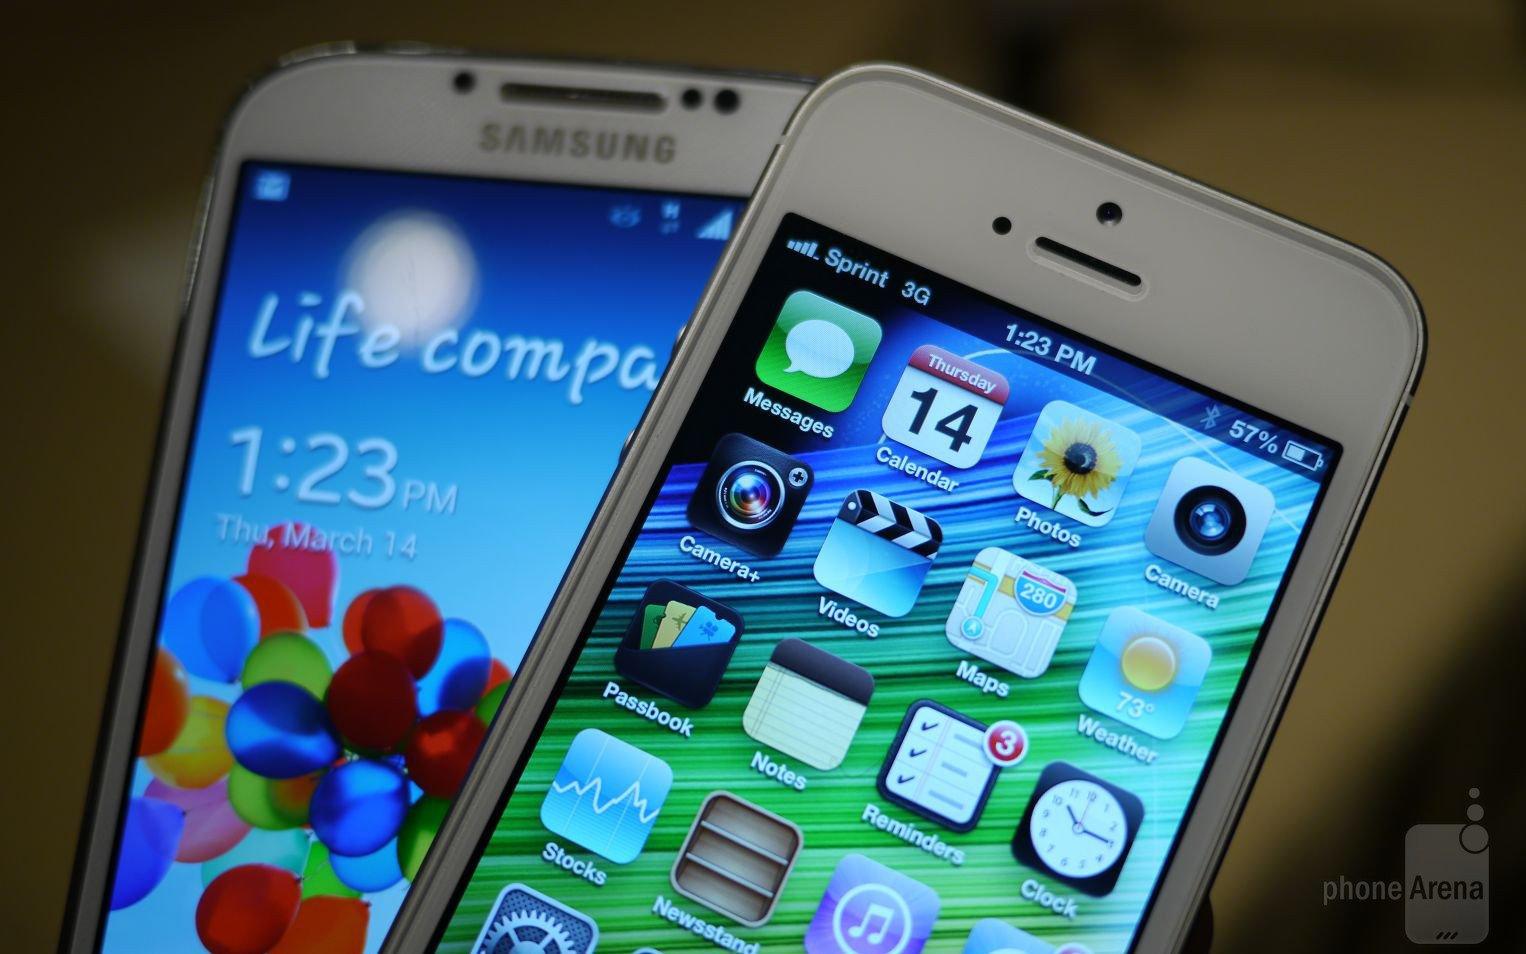 Samsung Galaxy S4 оказался самым мощным, а iPhone 5 - самым слабым